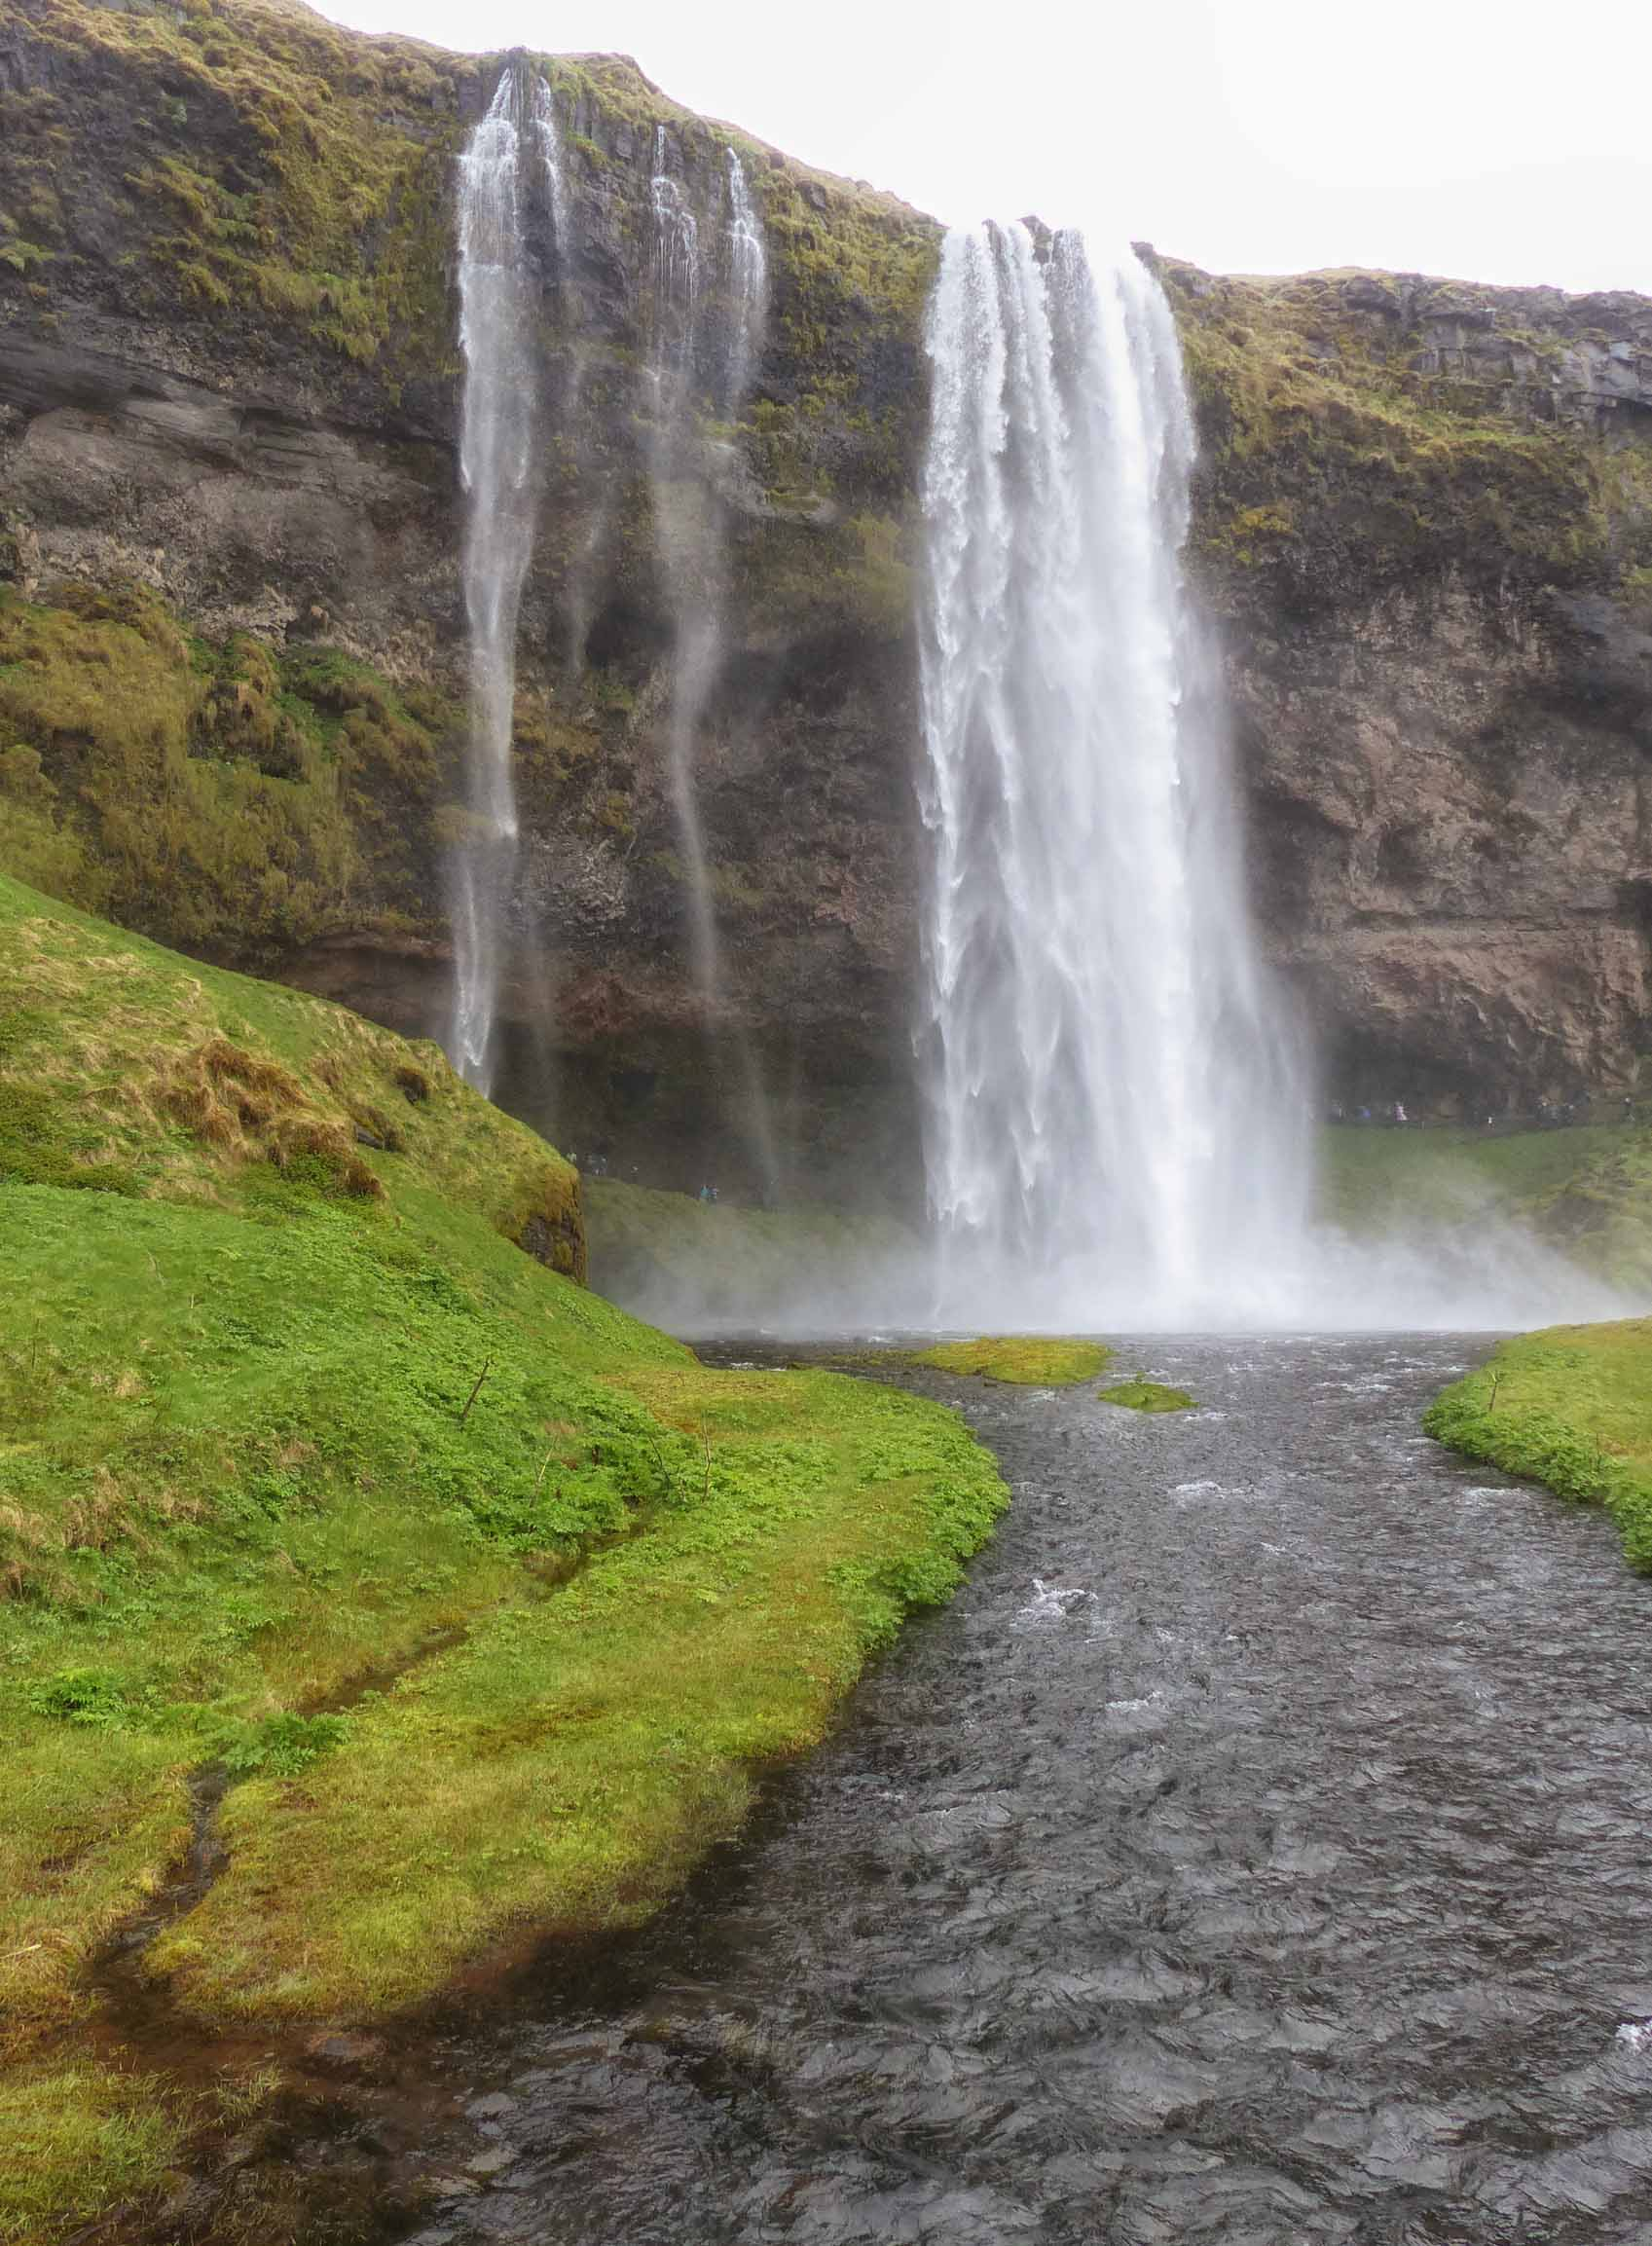 Veil-like waterfall and river